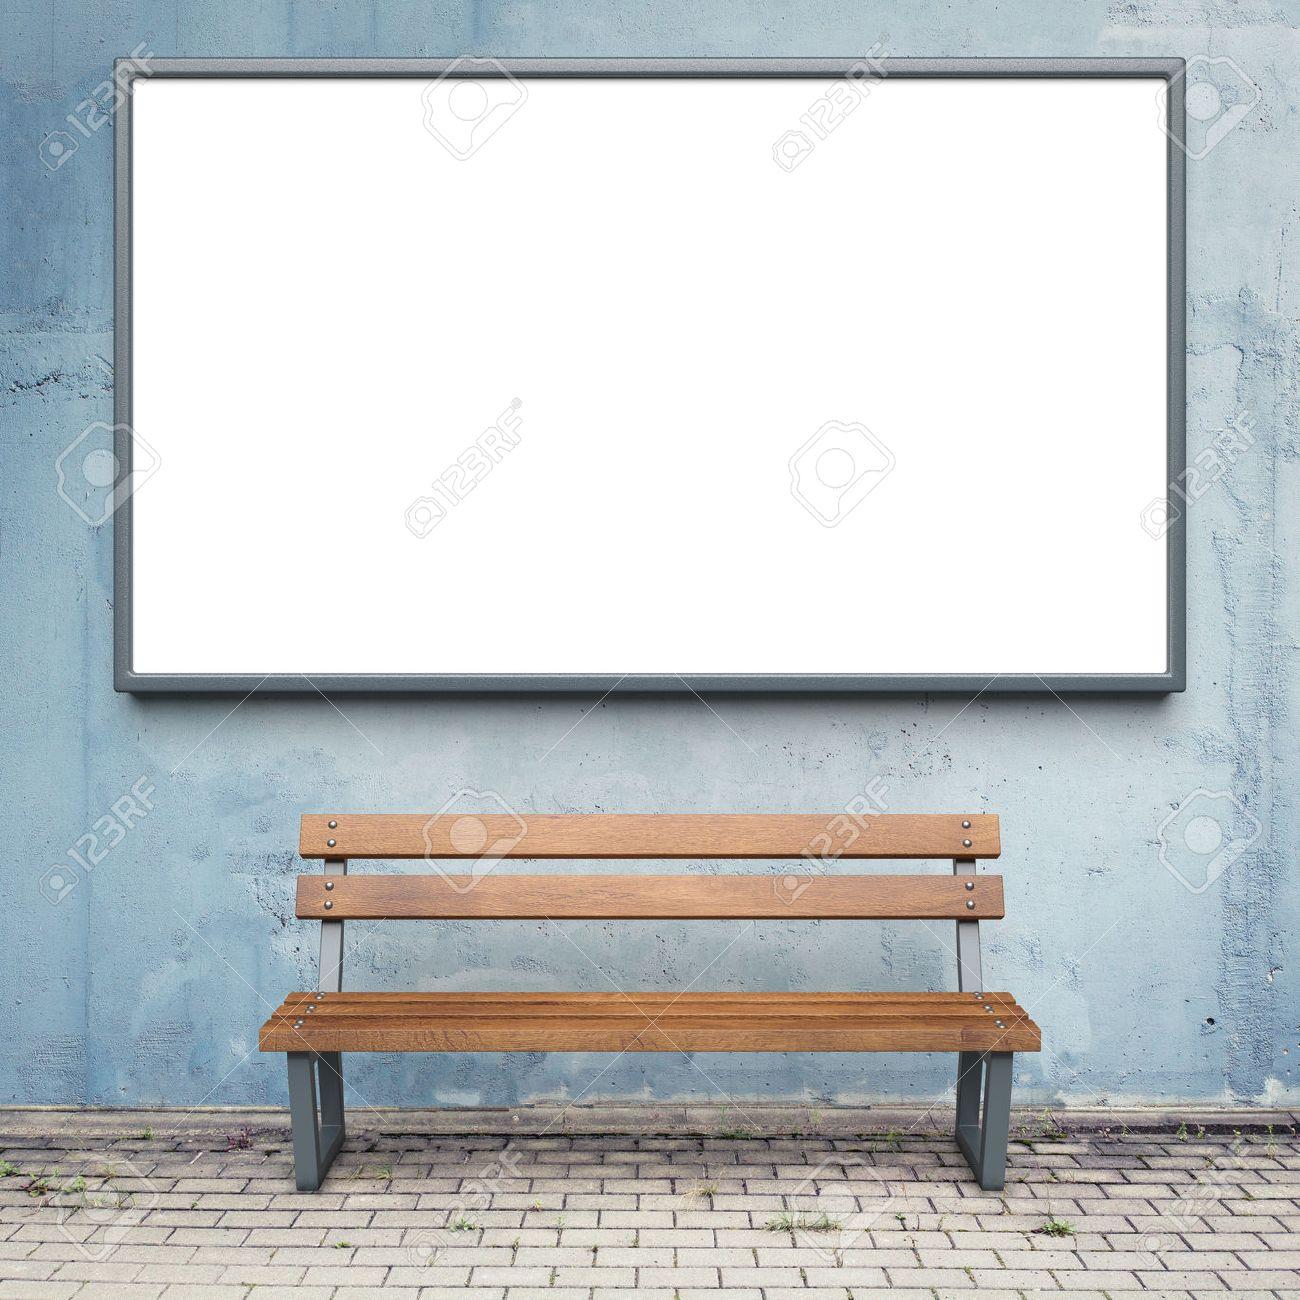 Blank advertising billboard on a street wall. Stock Photo - 42104071